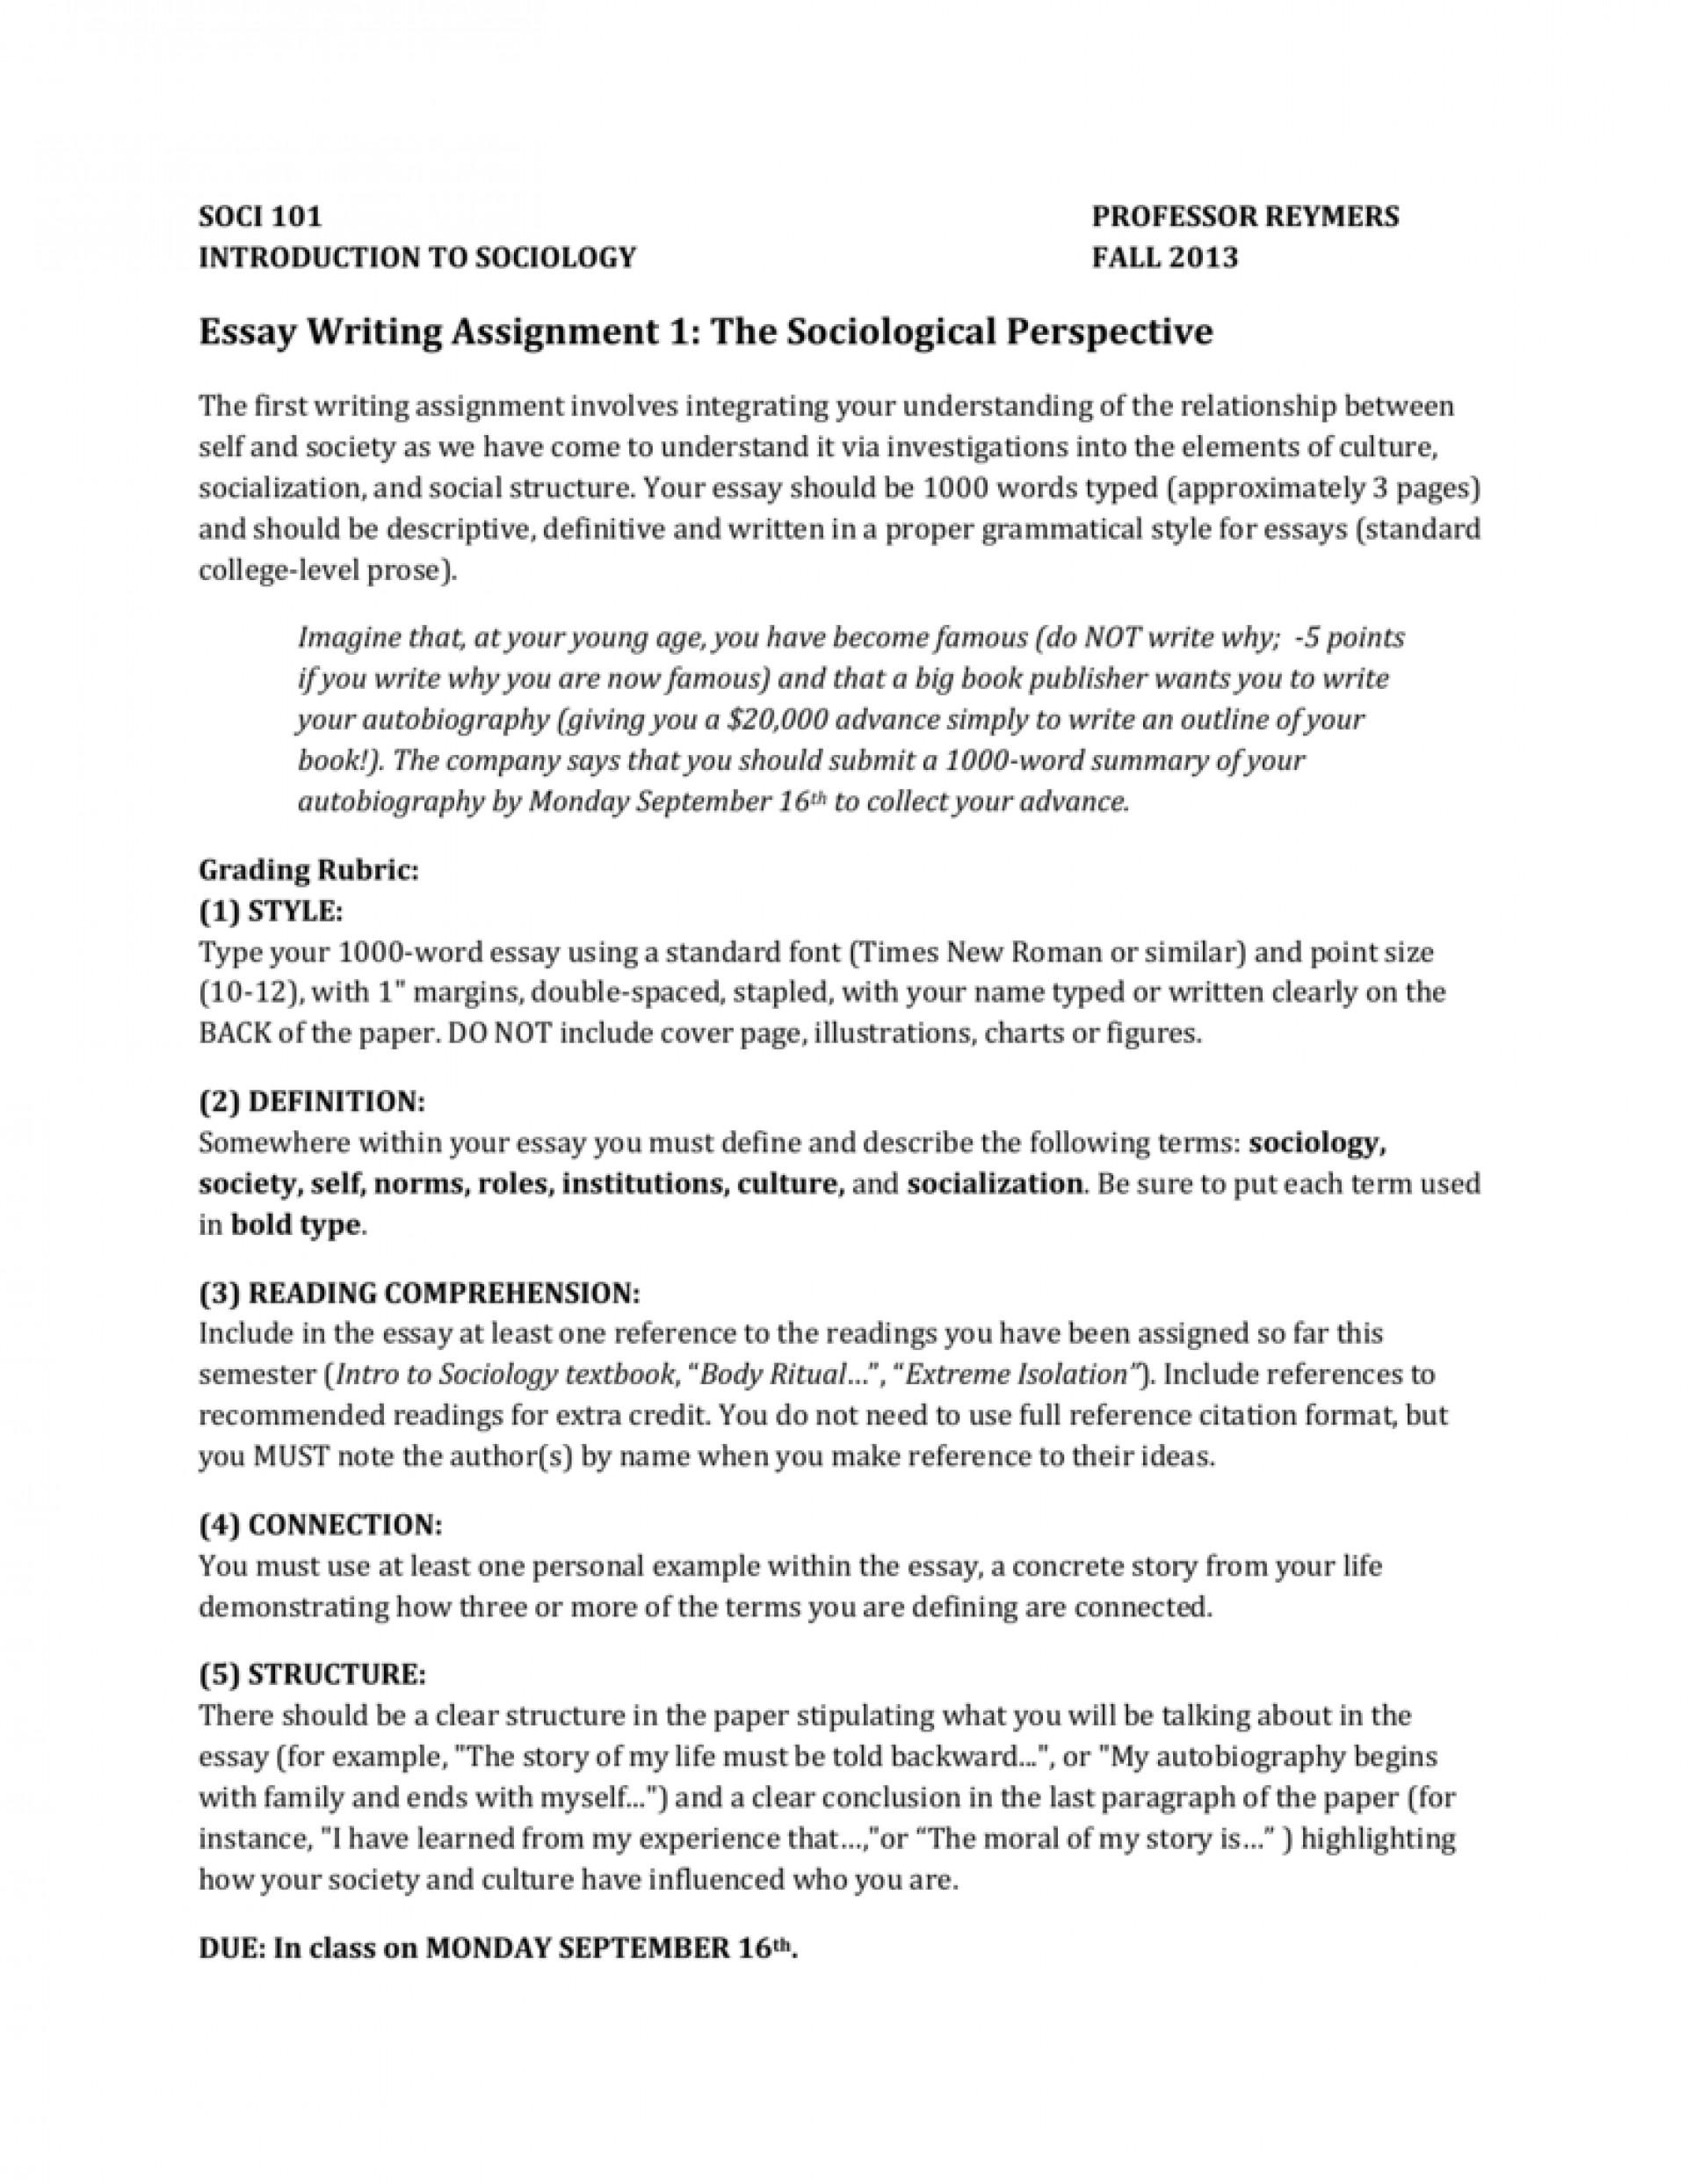 Problems of weimar republic essay